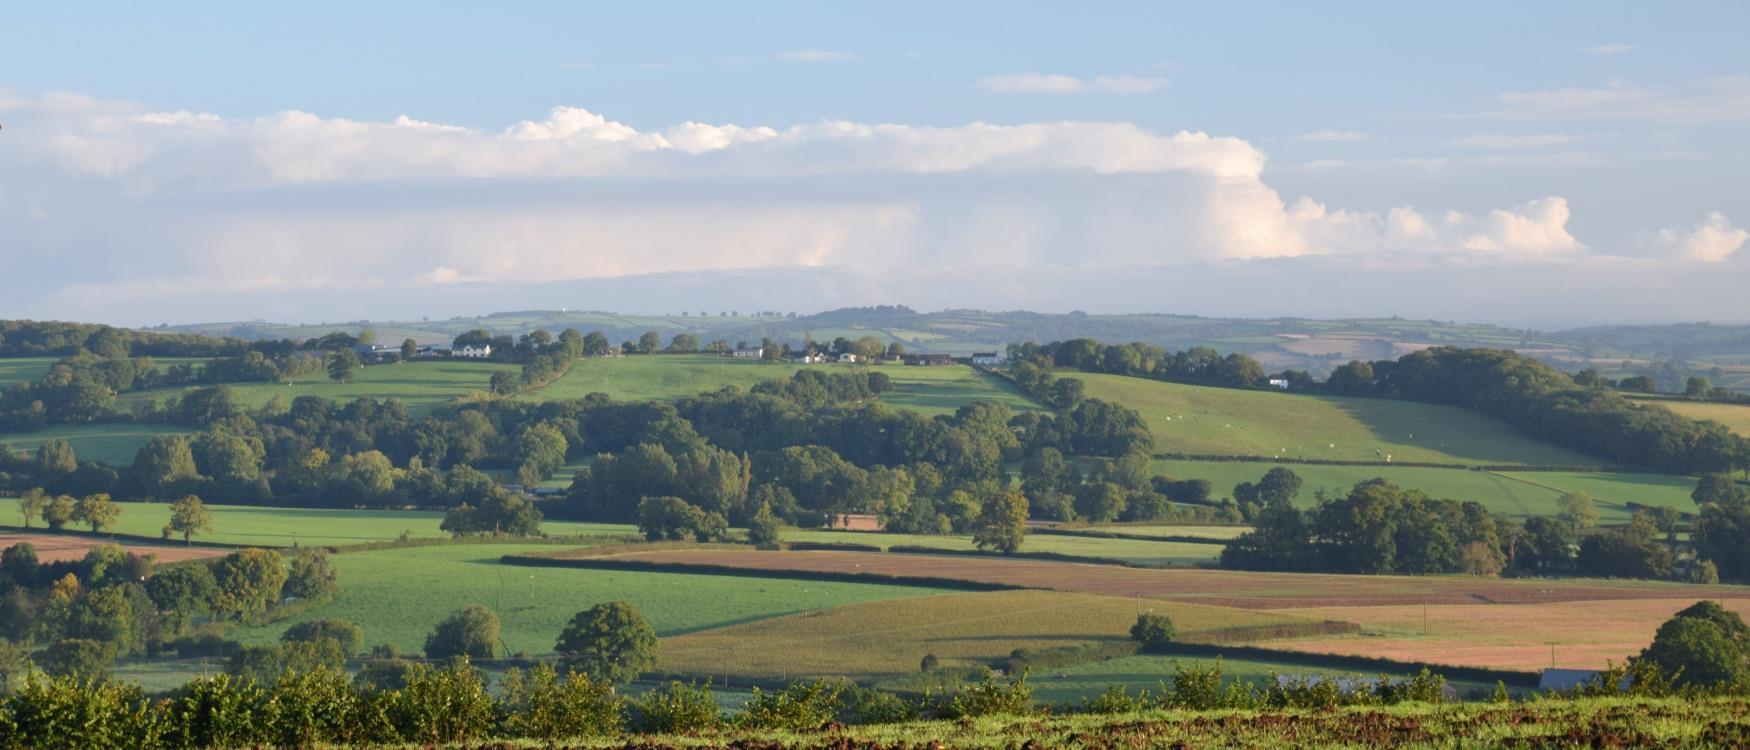 Countryside around Cullompton